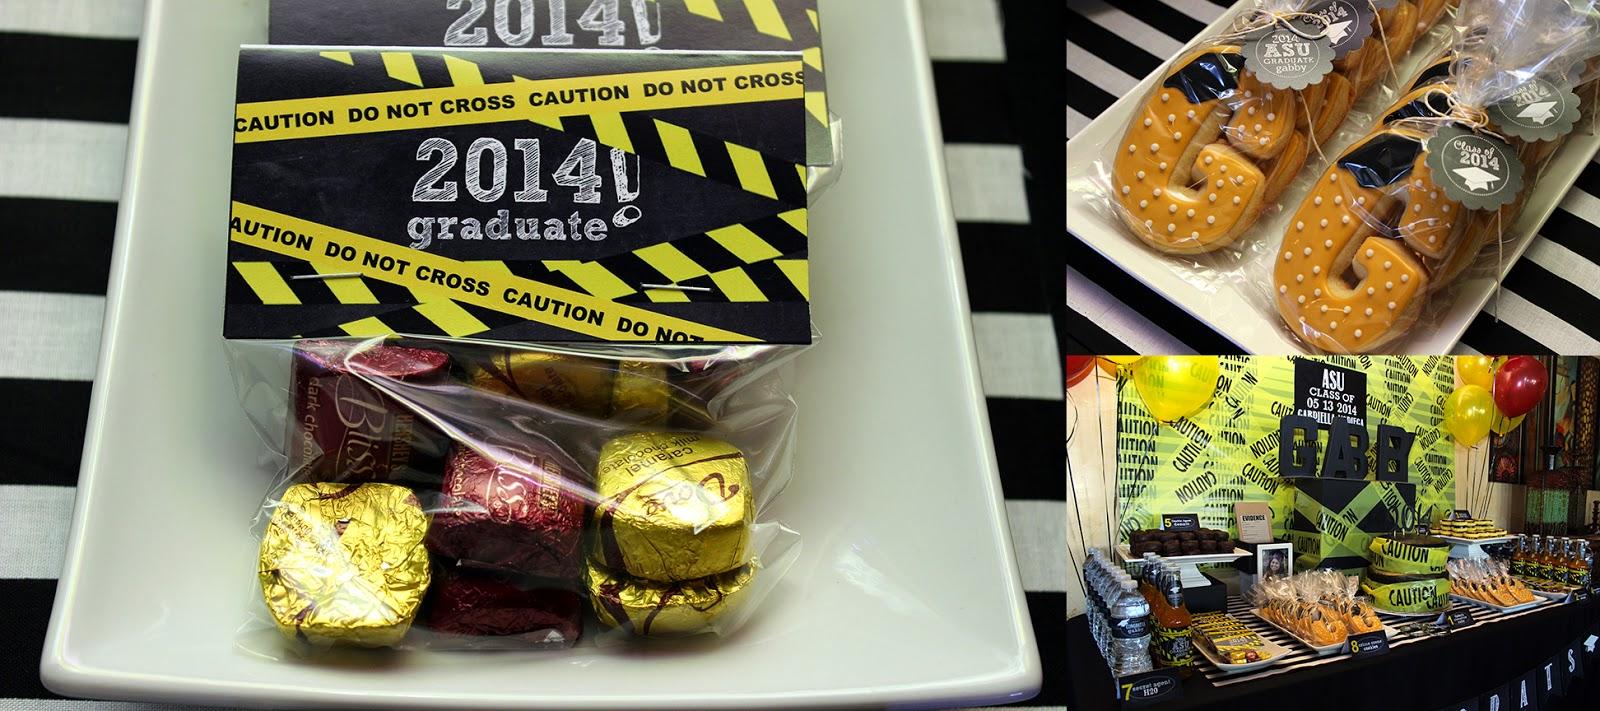 2014 graduation decorations - Wednesday May 21 2014